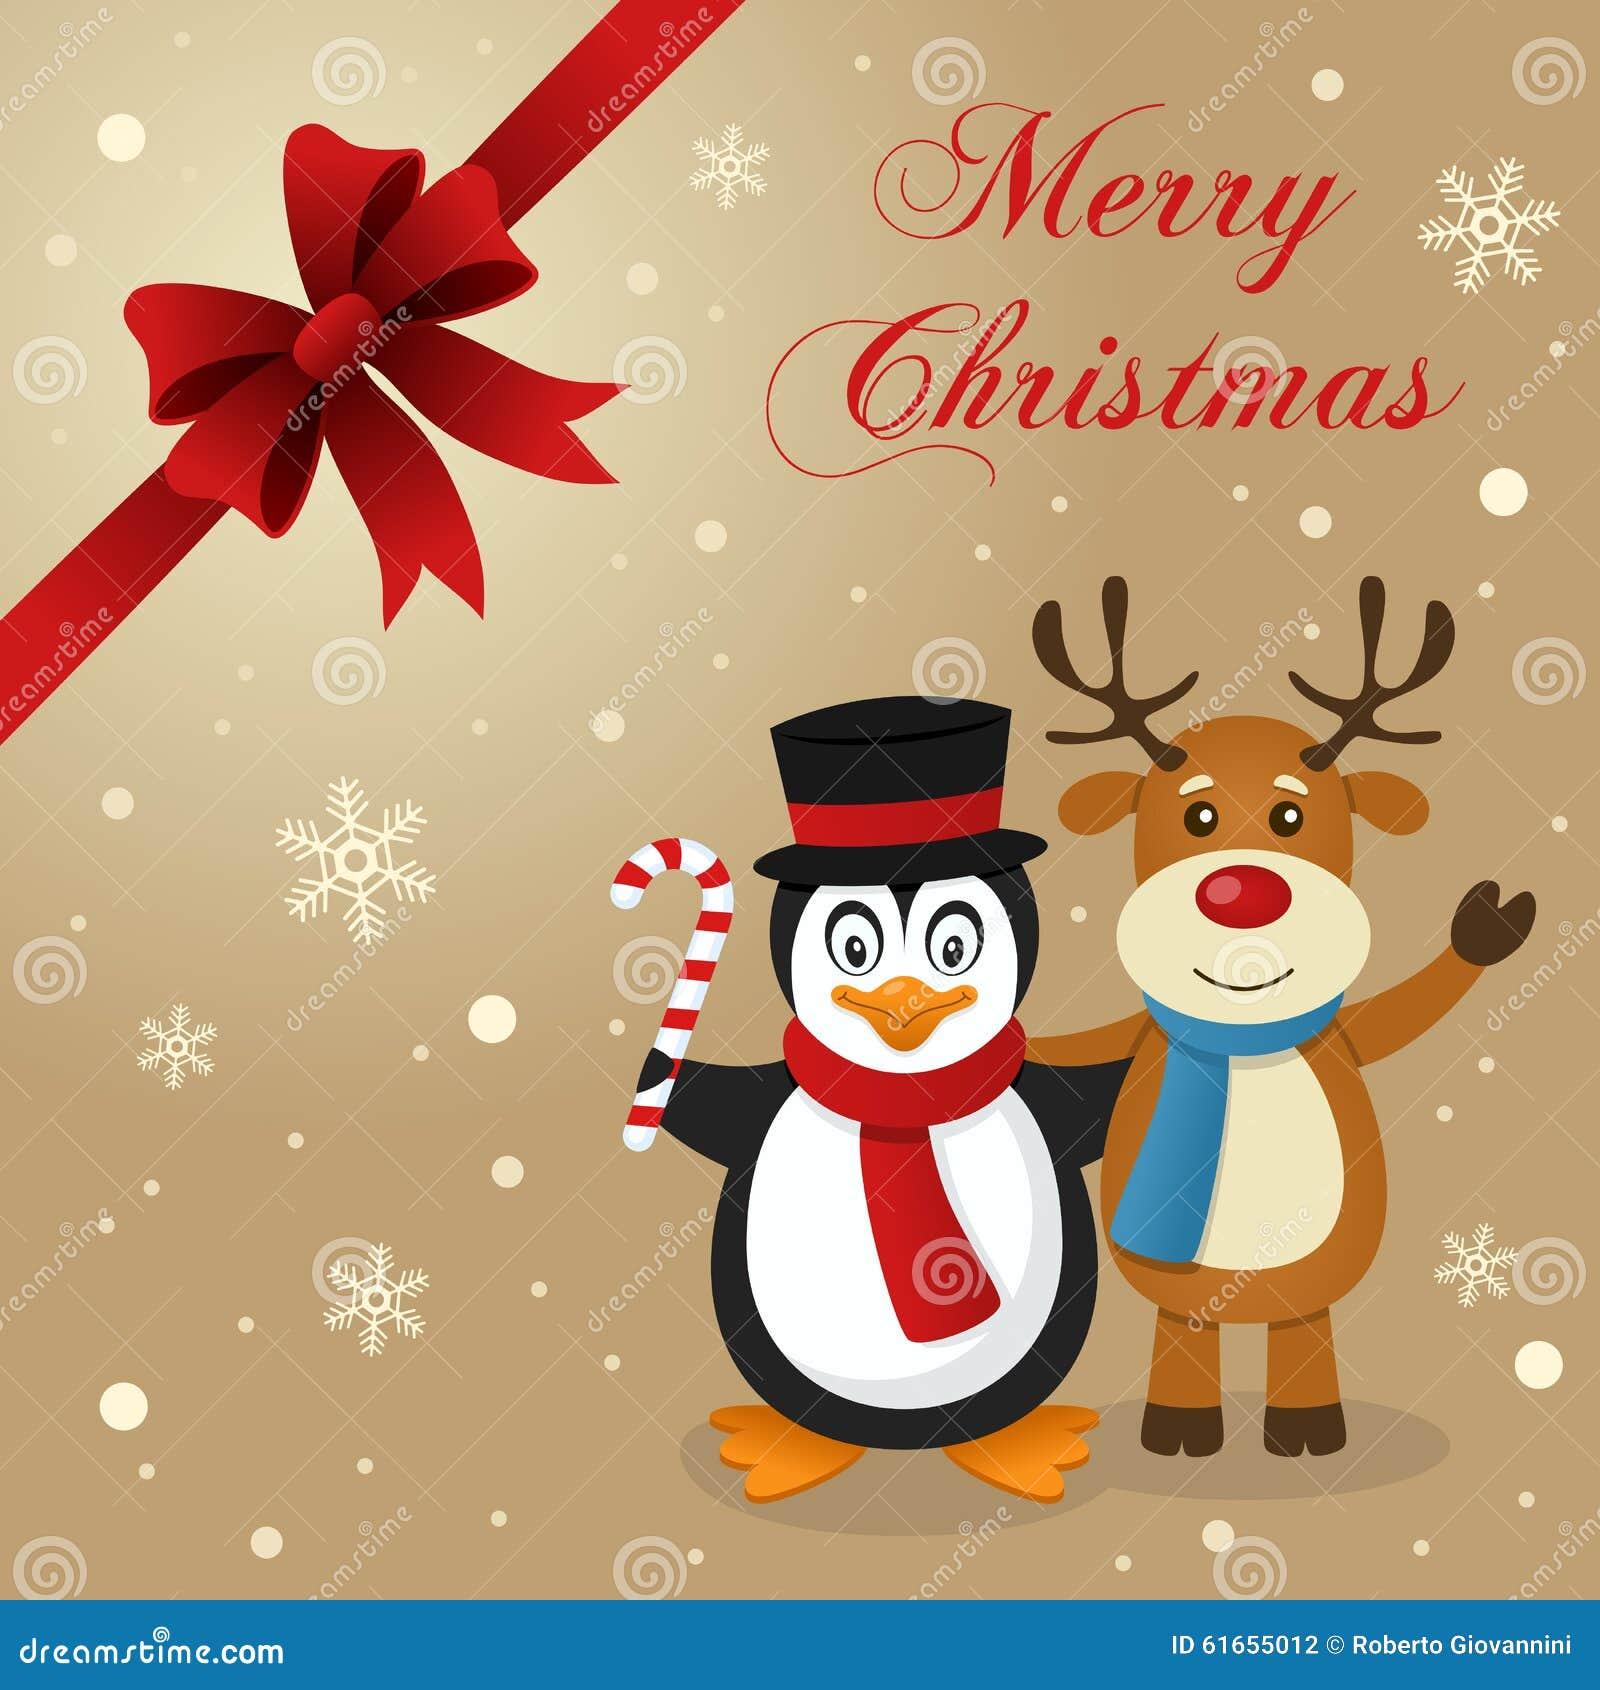 Penguin reindeer christmas card stock vector image for Penguin christmas cards homemade